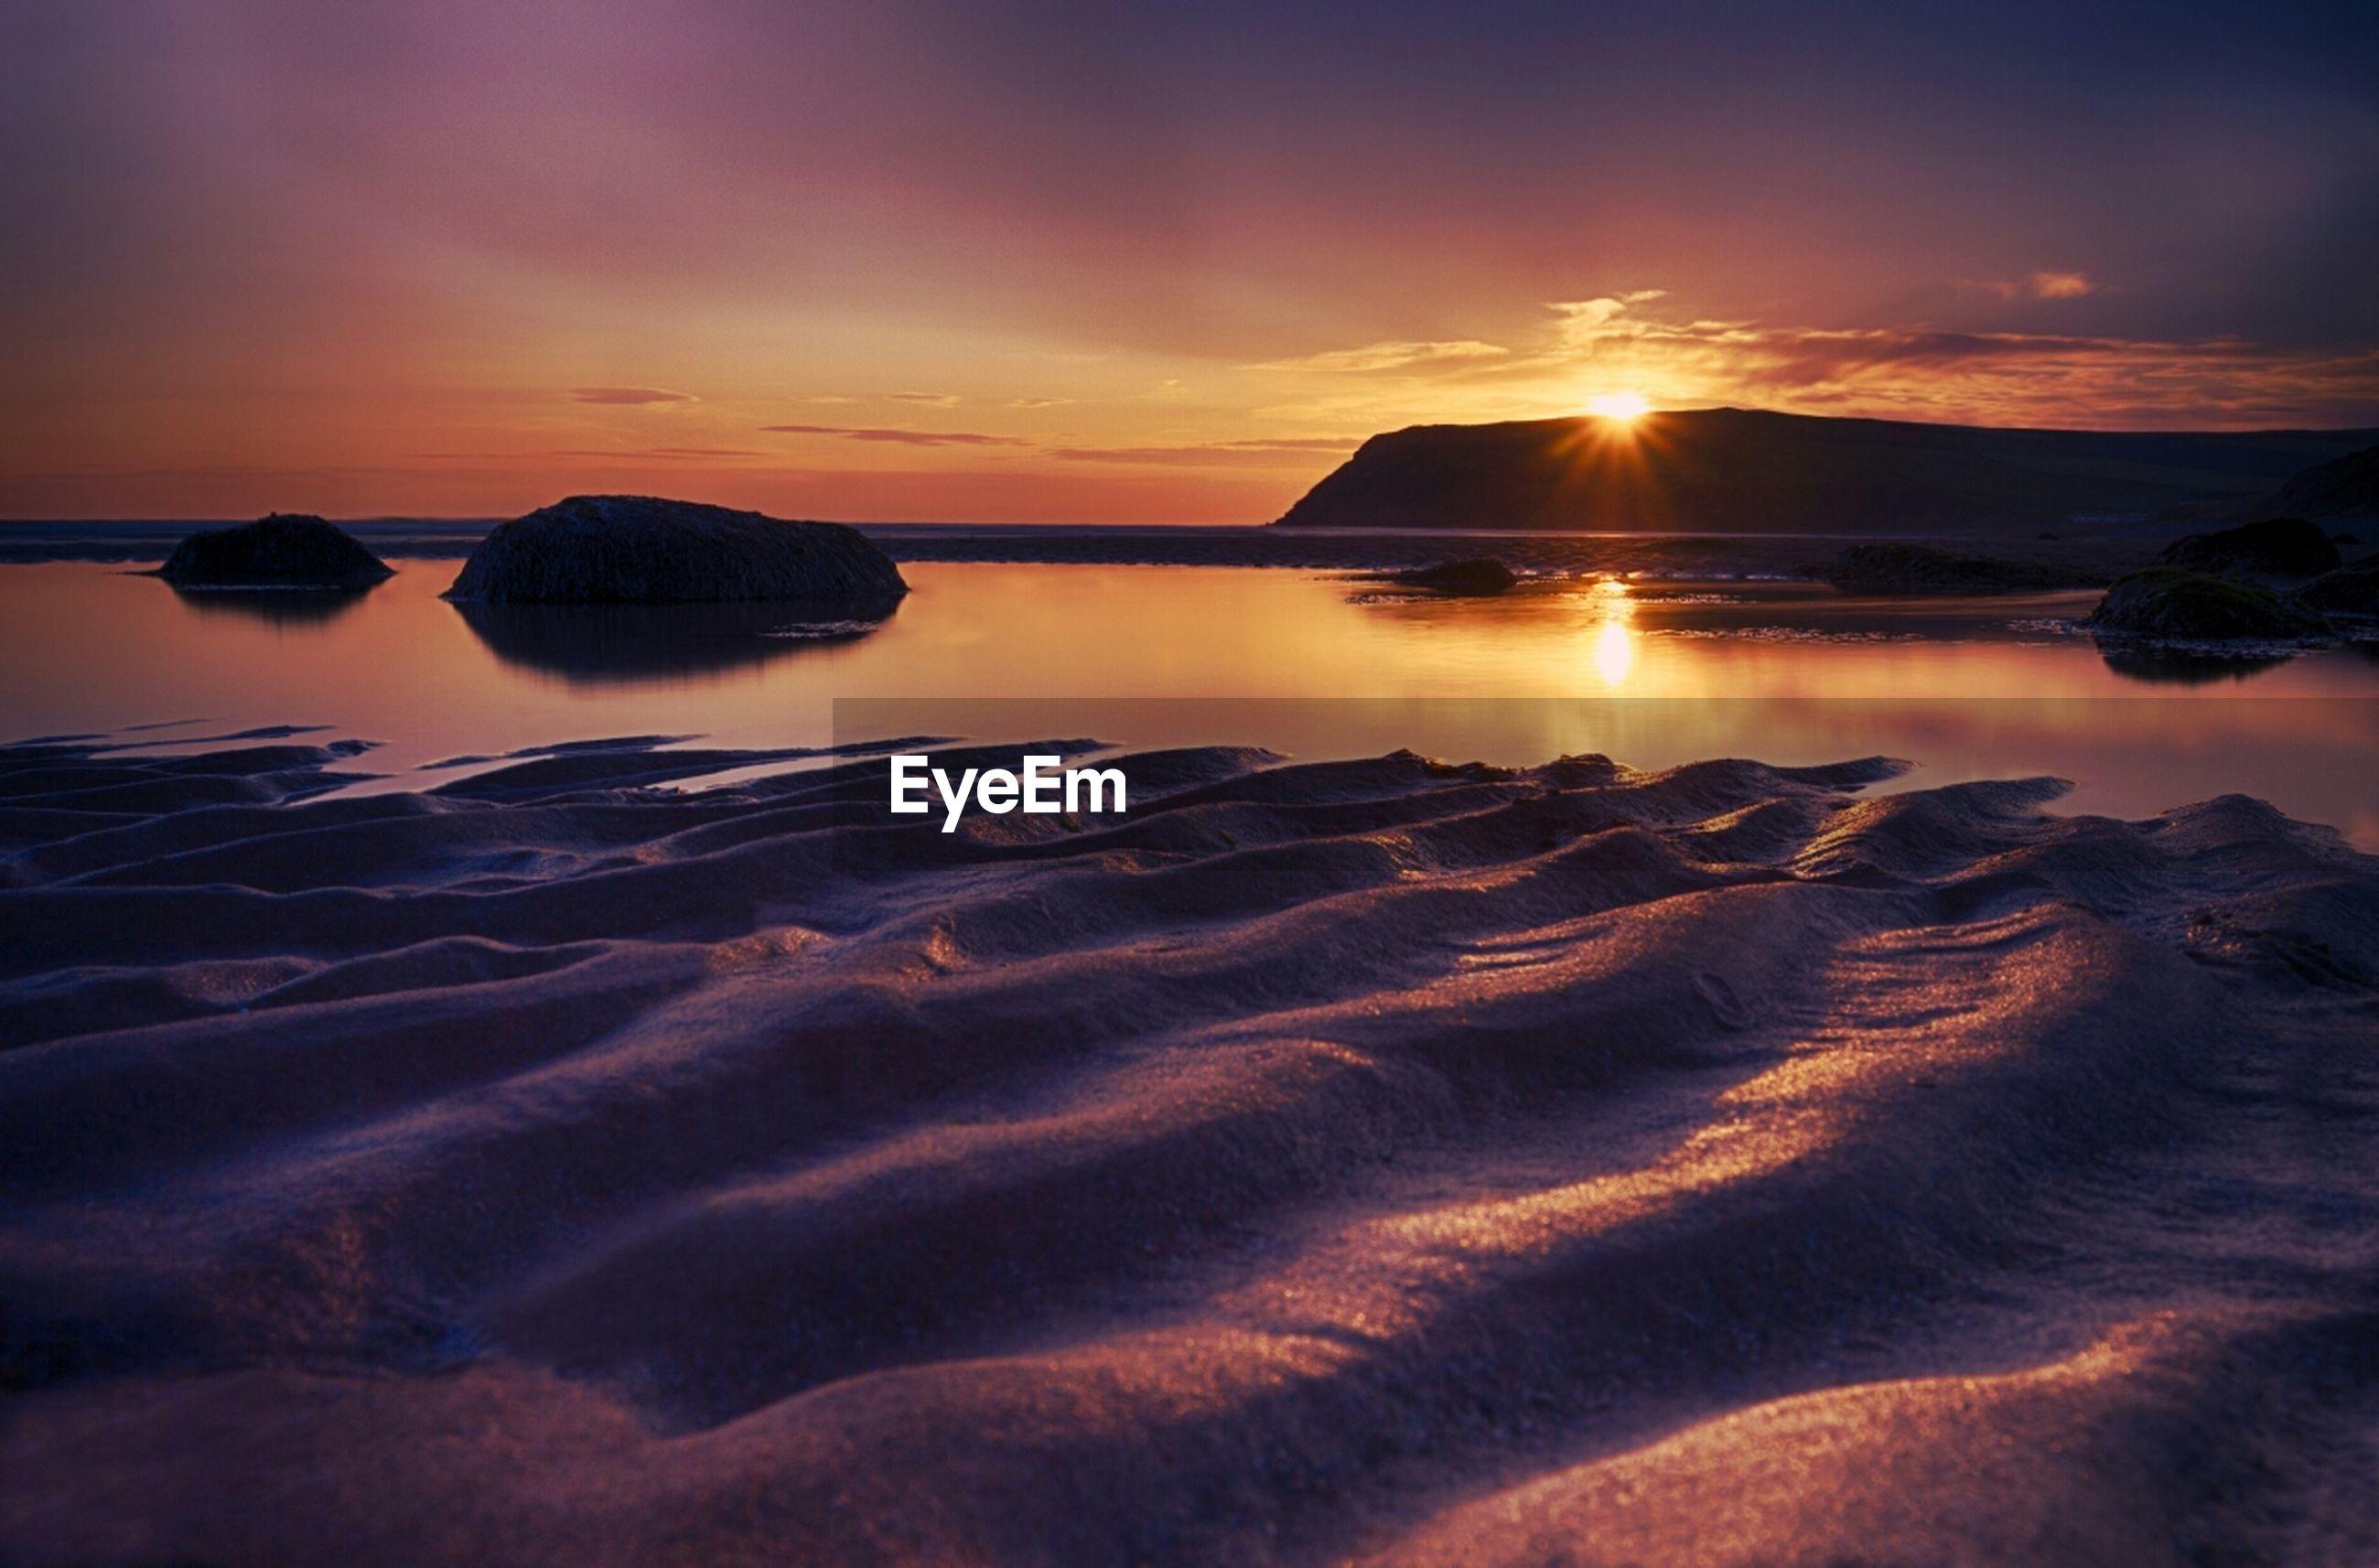 sunset, water, tranquil scene, scenics, tranquility, beauty in nature, sea, sky, beach, reflection, orange color, nature, idyllic, sun, shore, cloud - sky, sand, majestic, sunlight, mountain